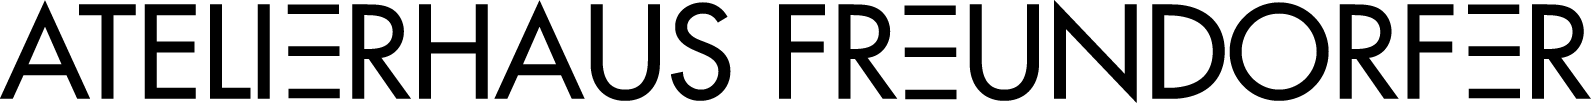 ATELIERHAUS FREUNDORFER